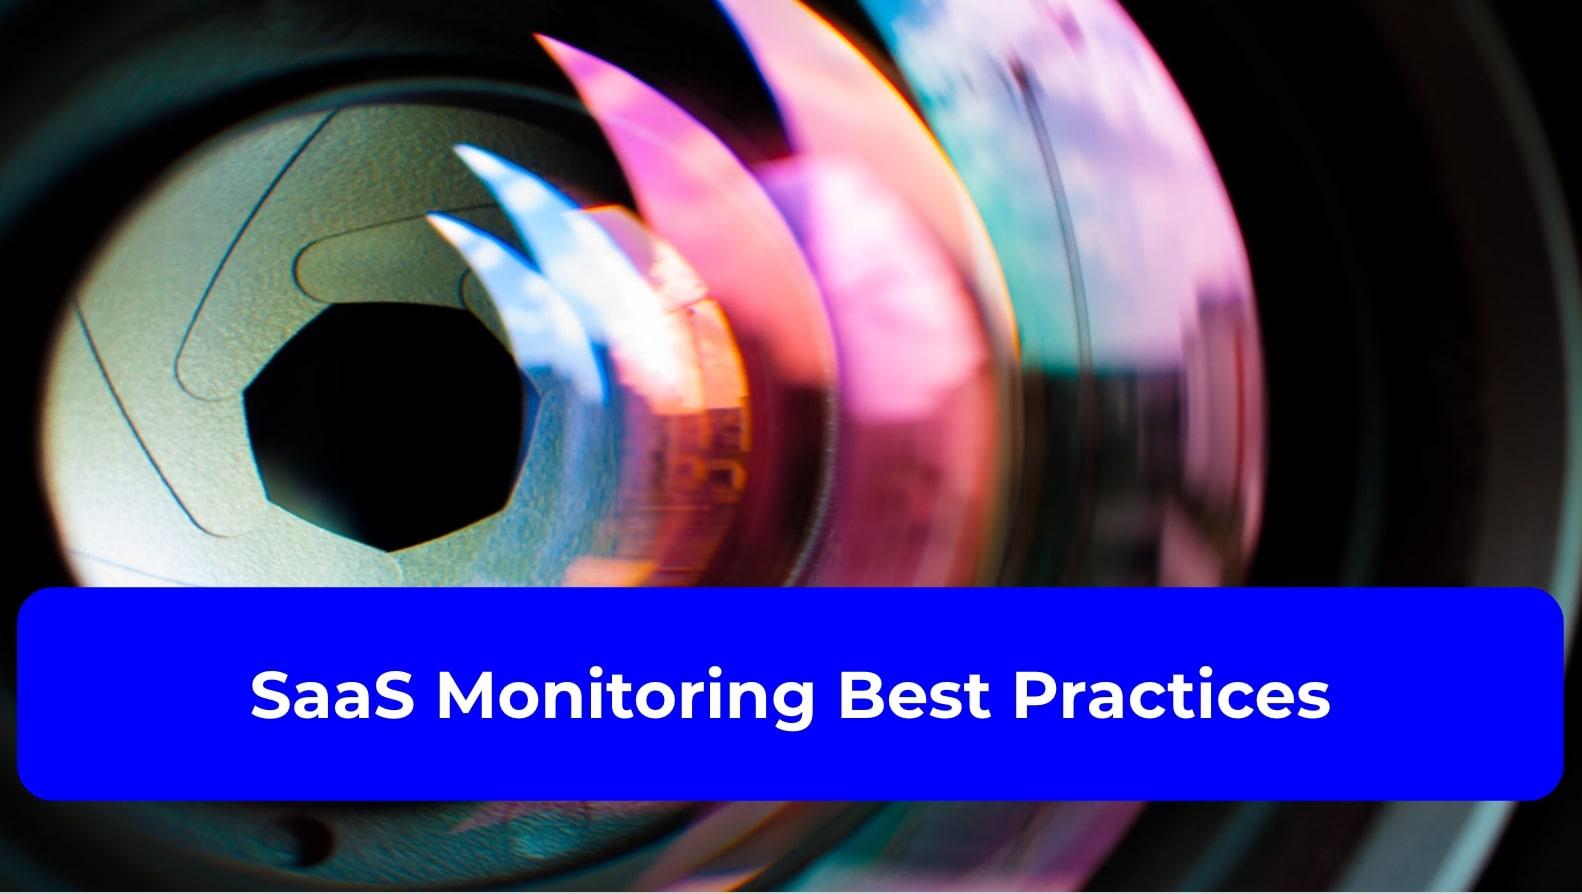 SaaS Monitoring Best Practices